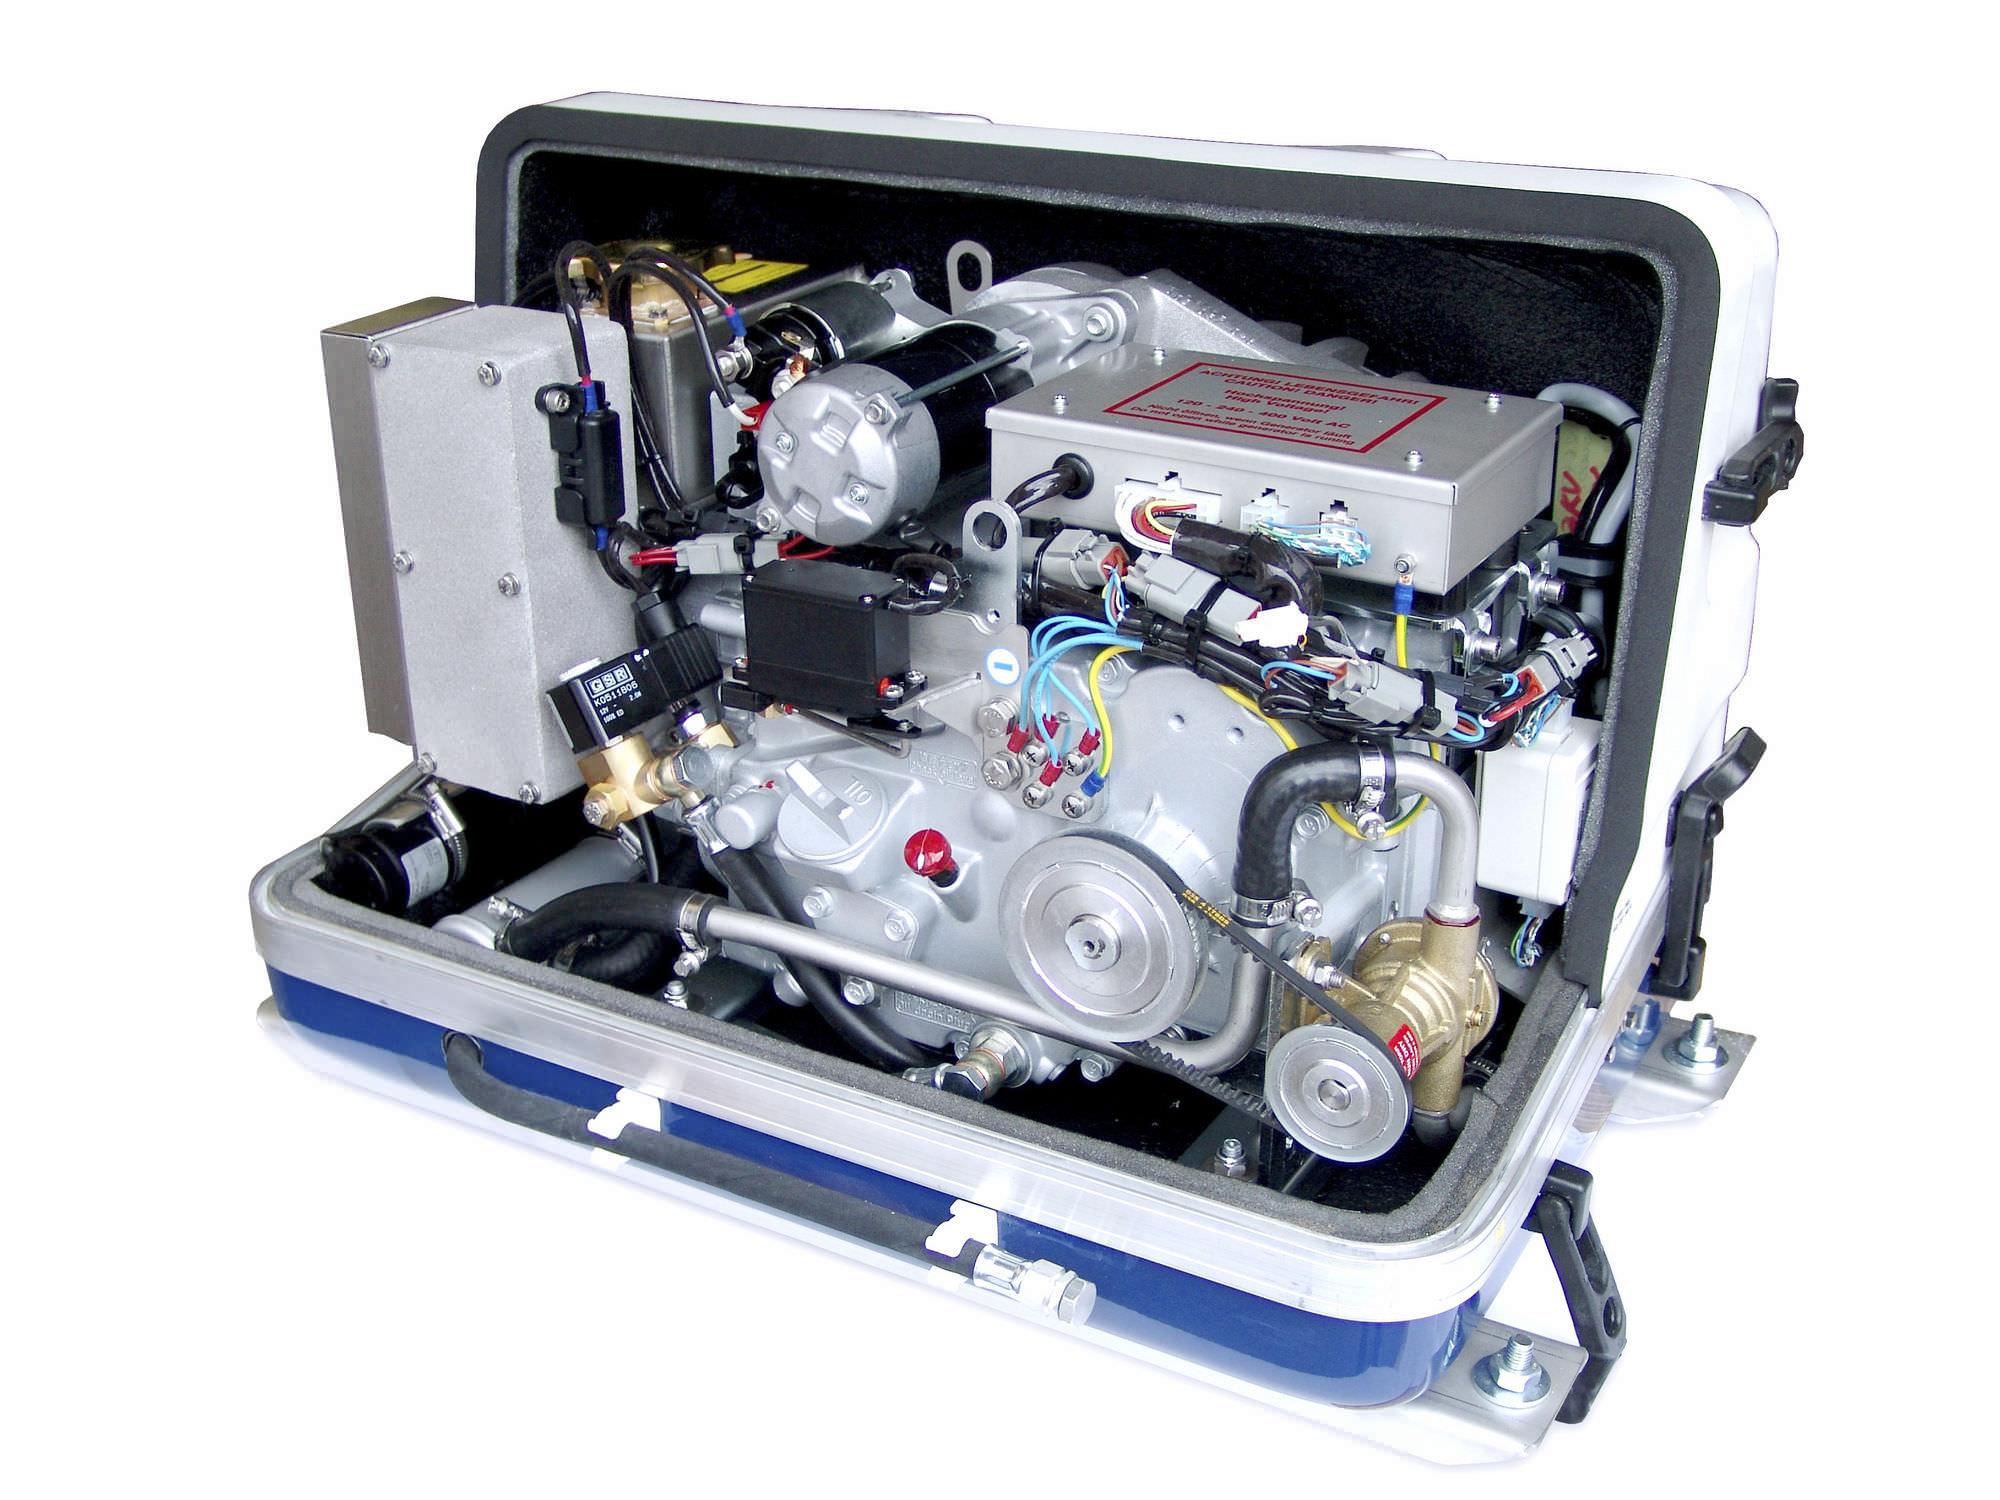 Boat generator set sel PANDA 5000i PMS Fischer Panda